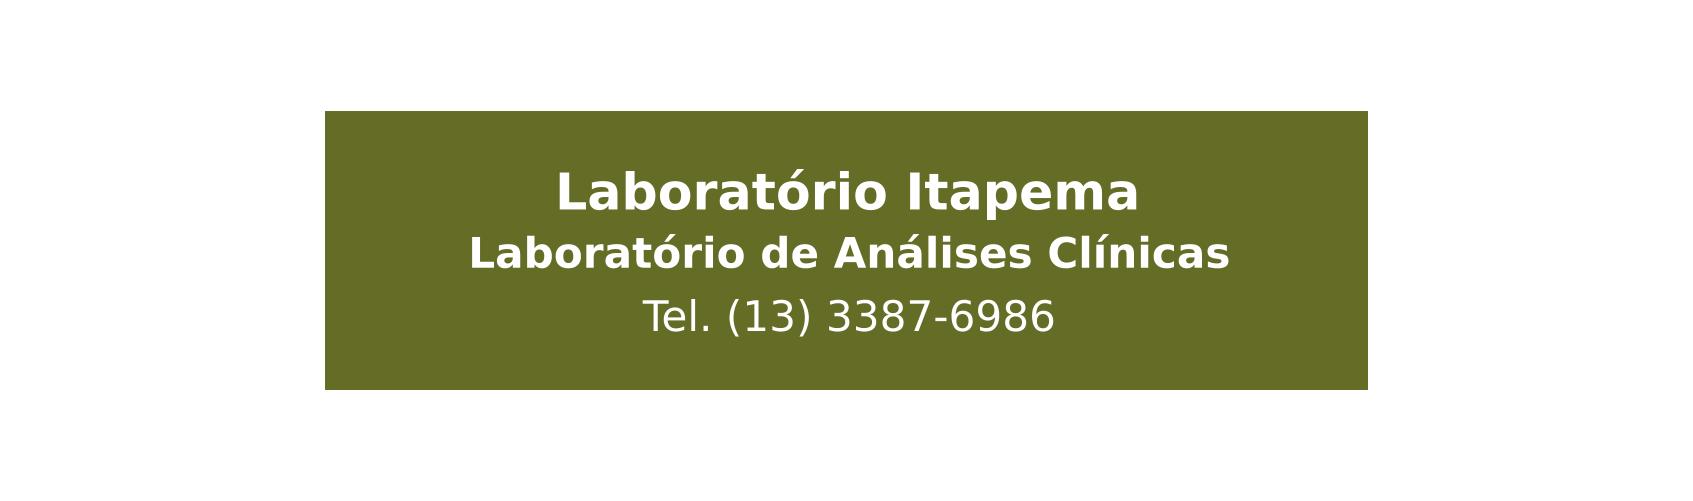 parceiros lab itapema 170818